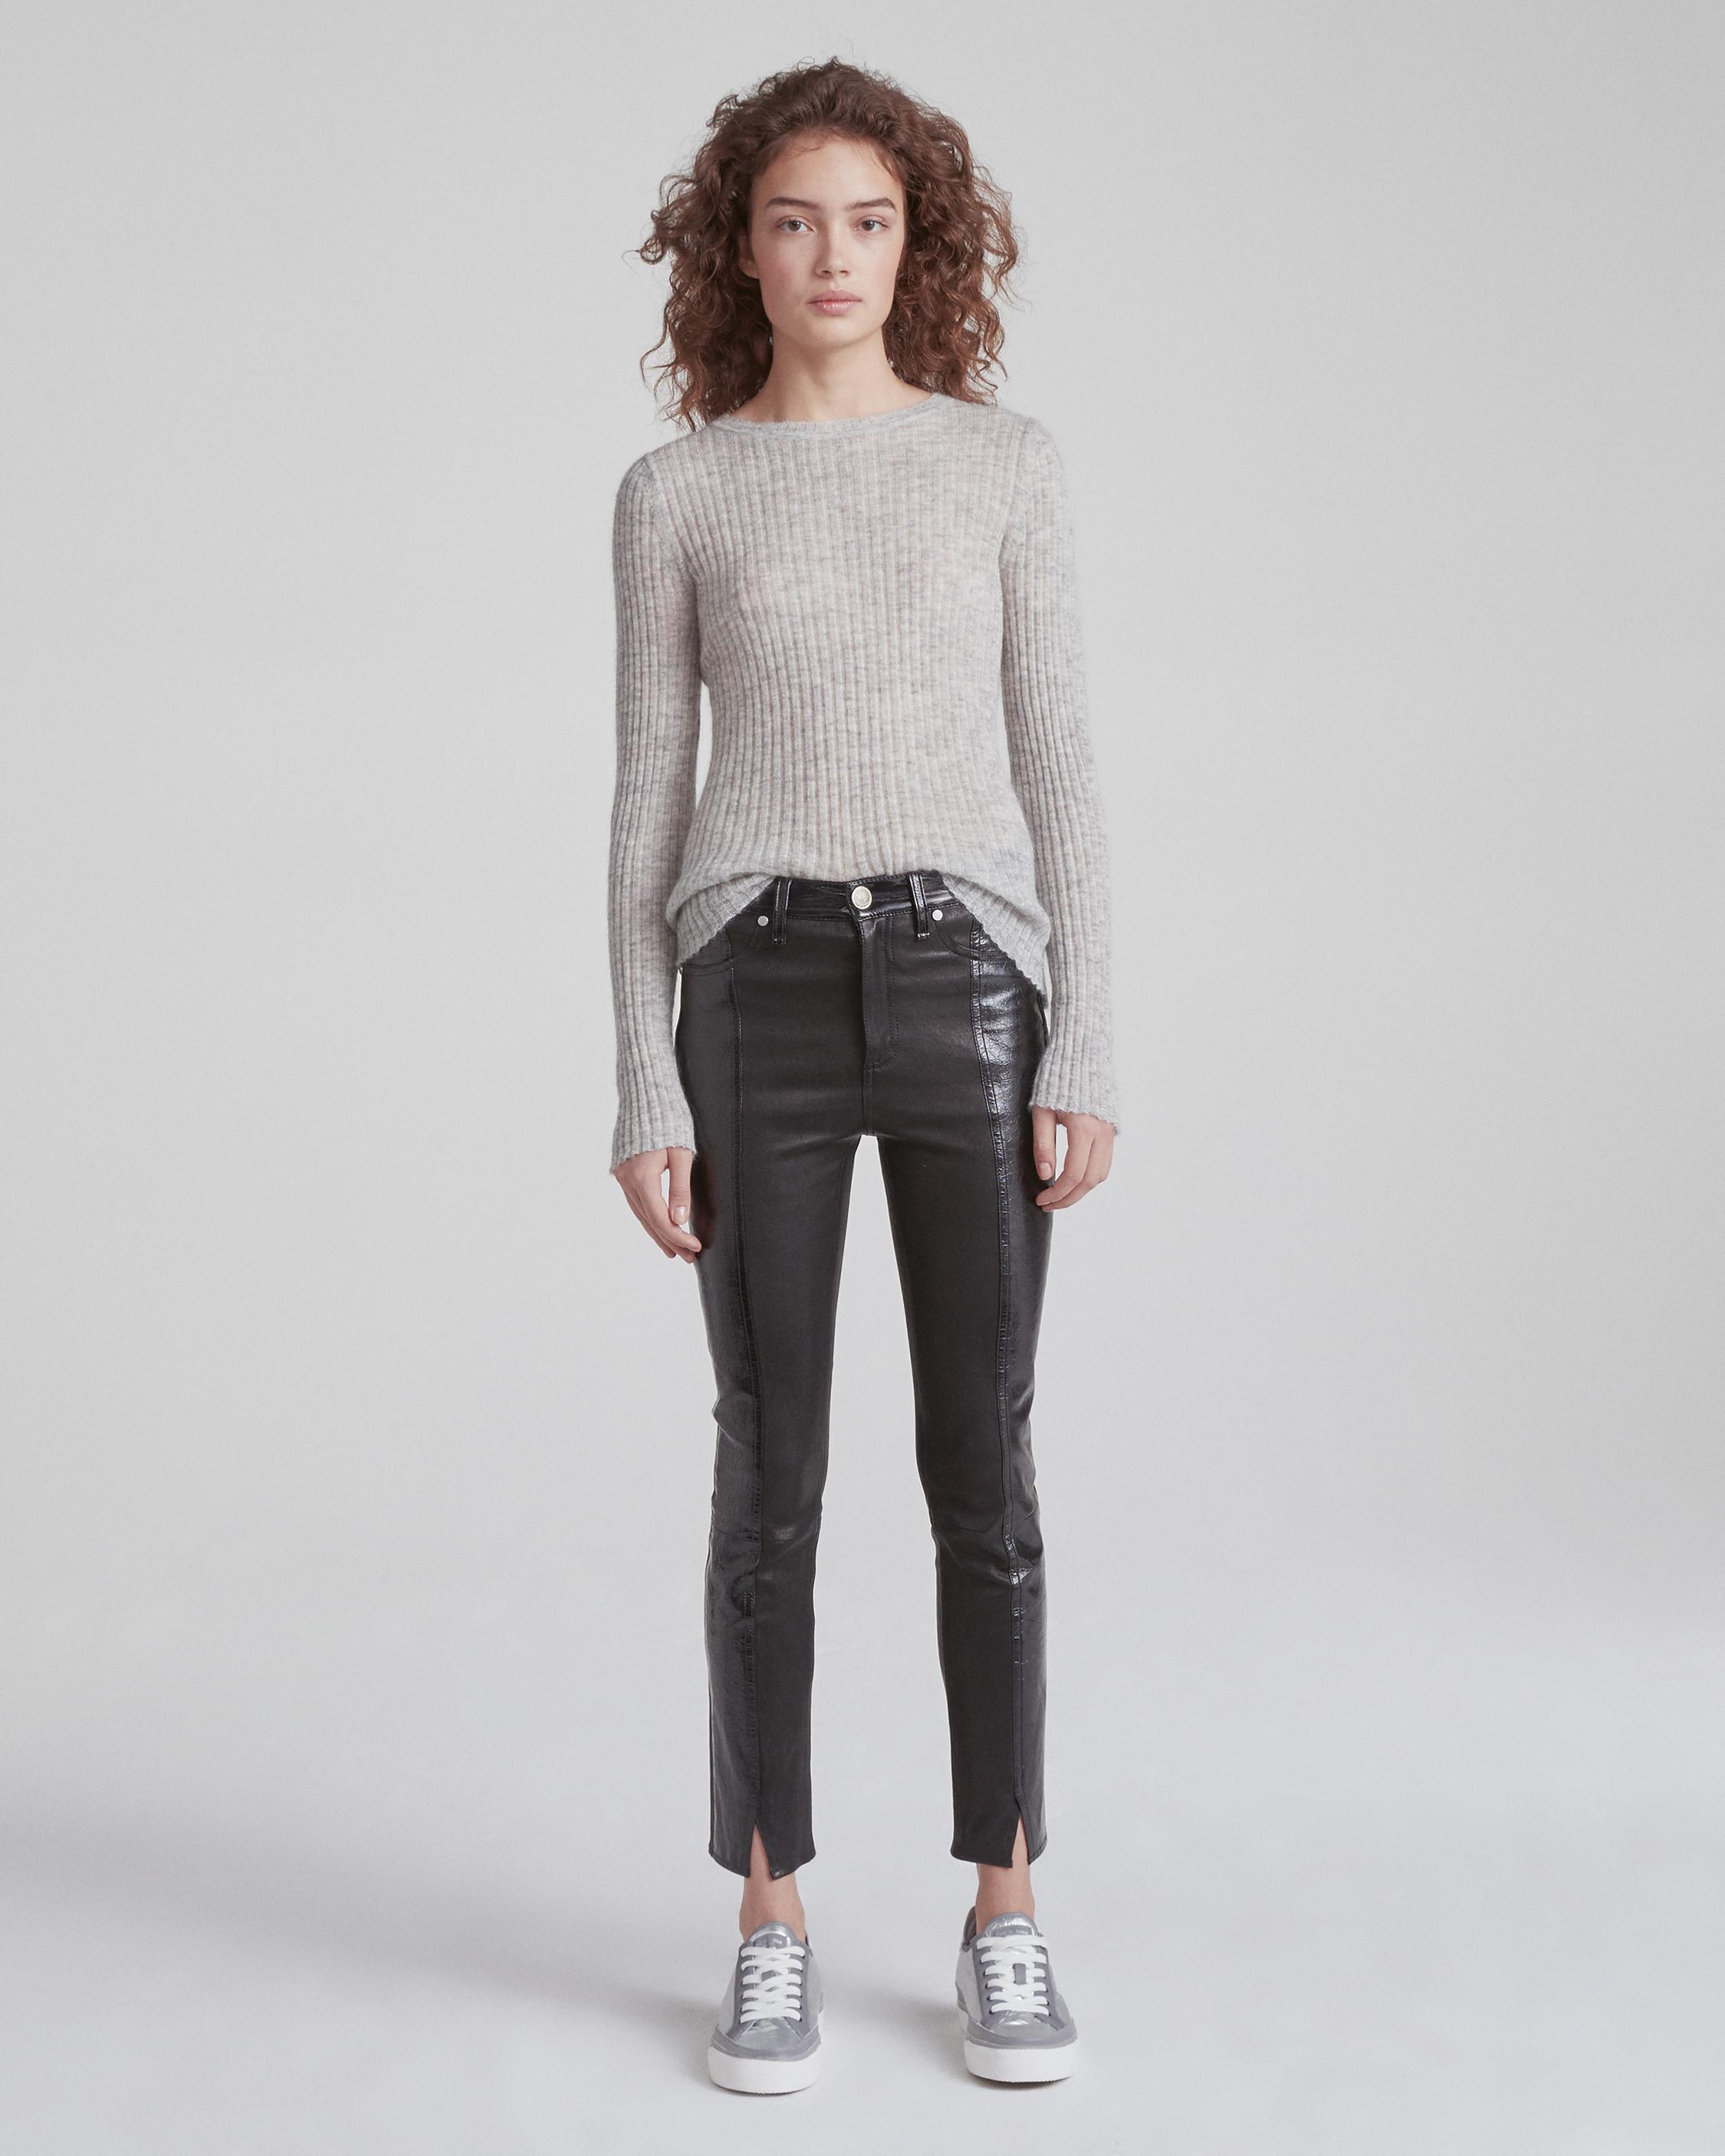 1785a0eb2f8af Evelyn Leather Pant | Women Bottoms | rag & bone